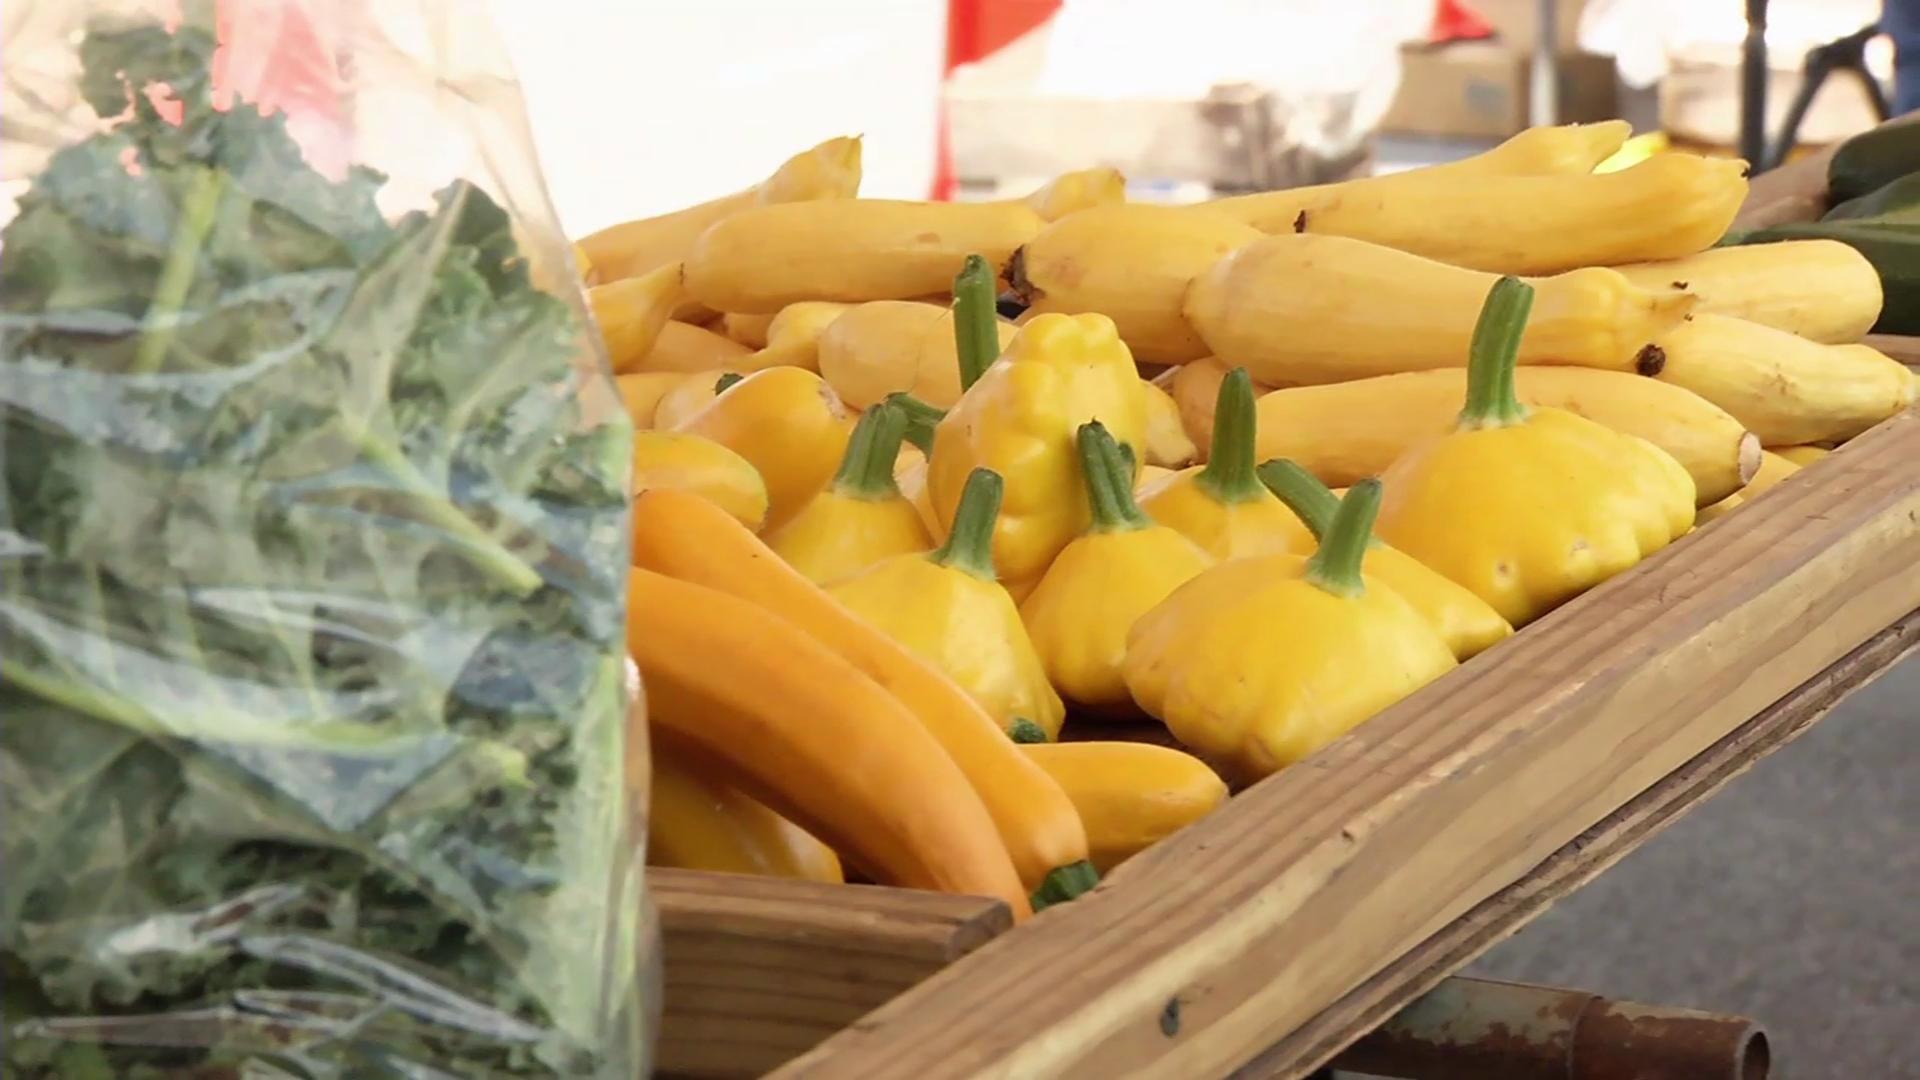 photo of produce at Crossroads Farmers Market Takoma Park